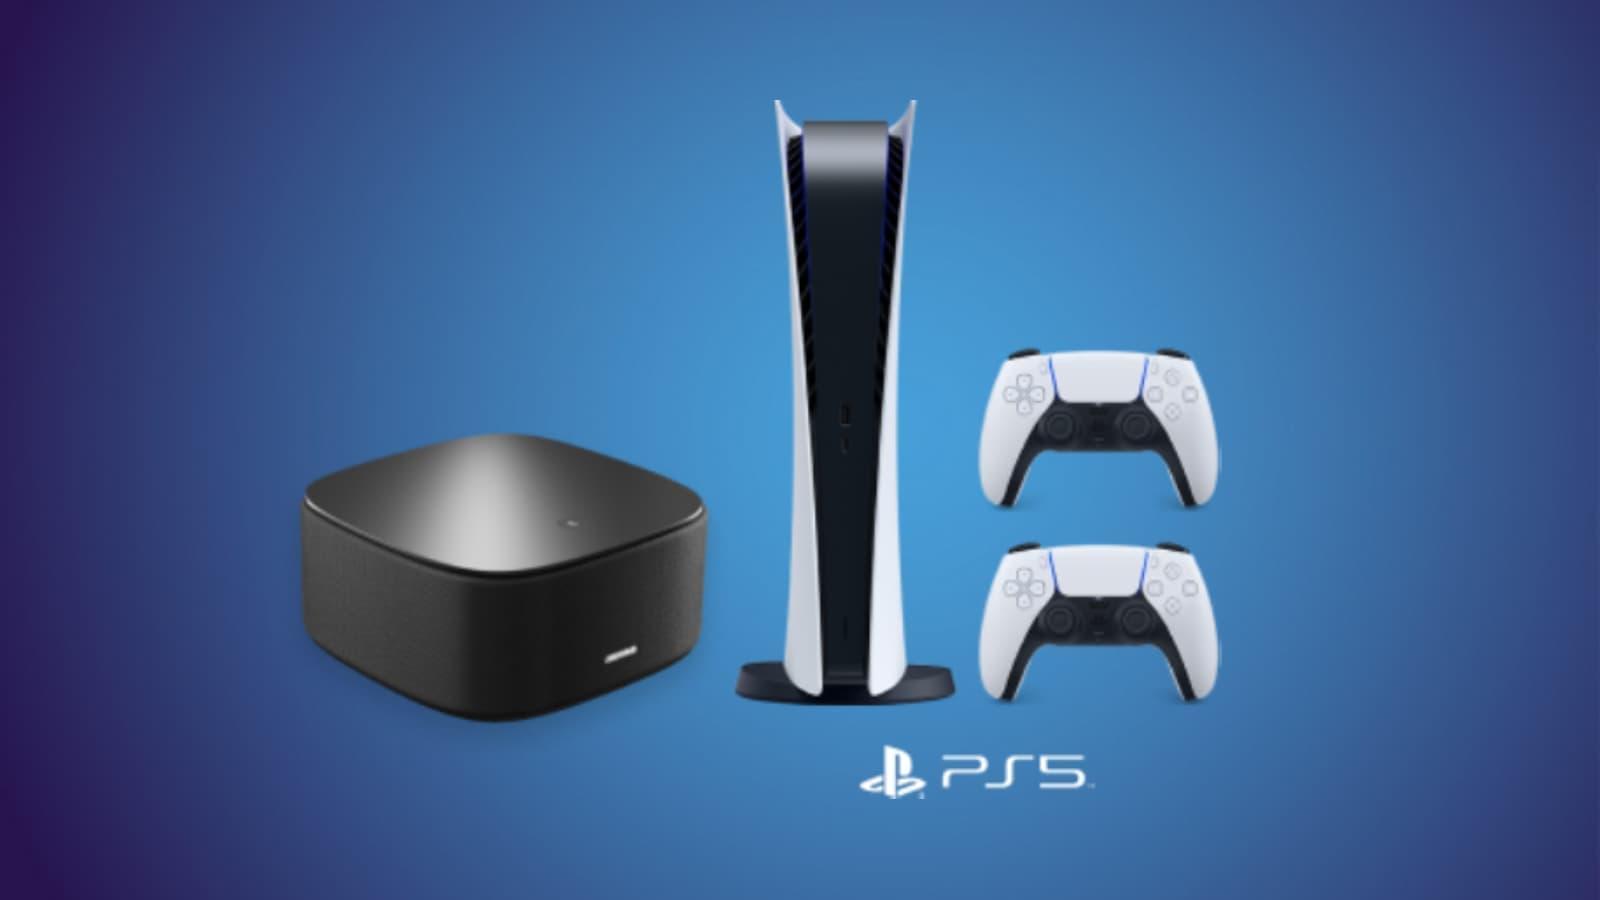 Box + PS5 Fibre Power : le combo ultra puissant chez SFR